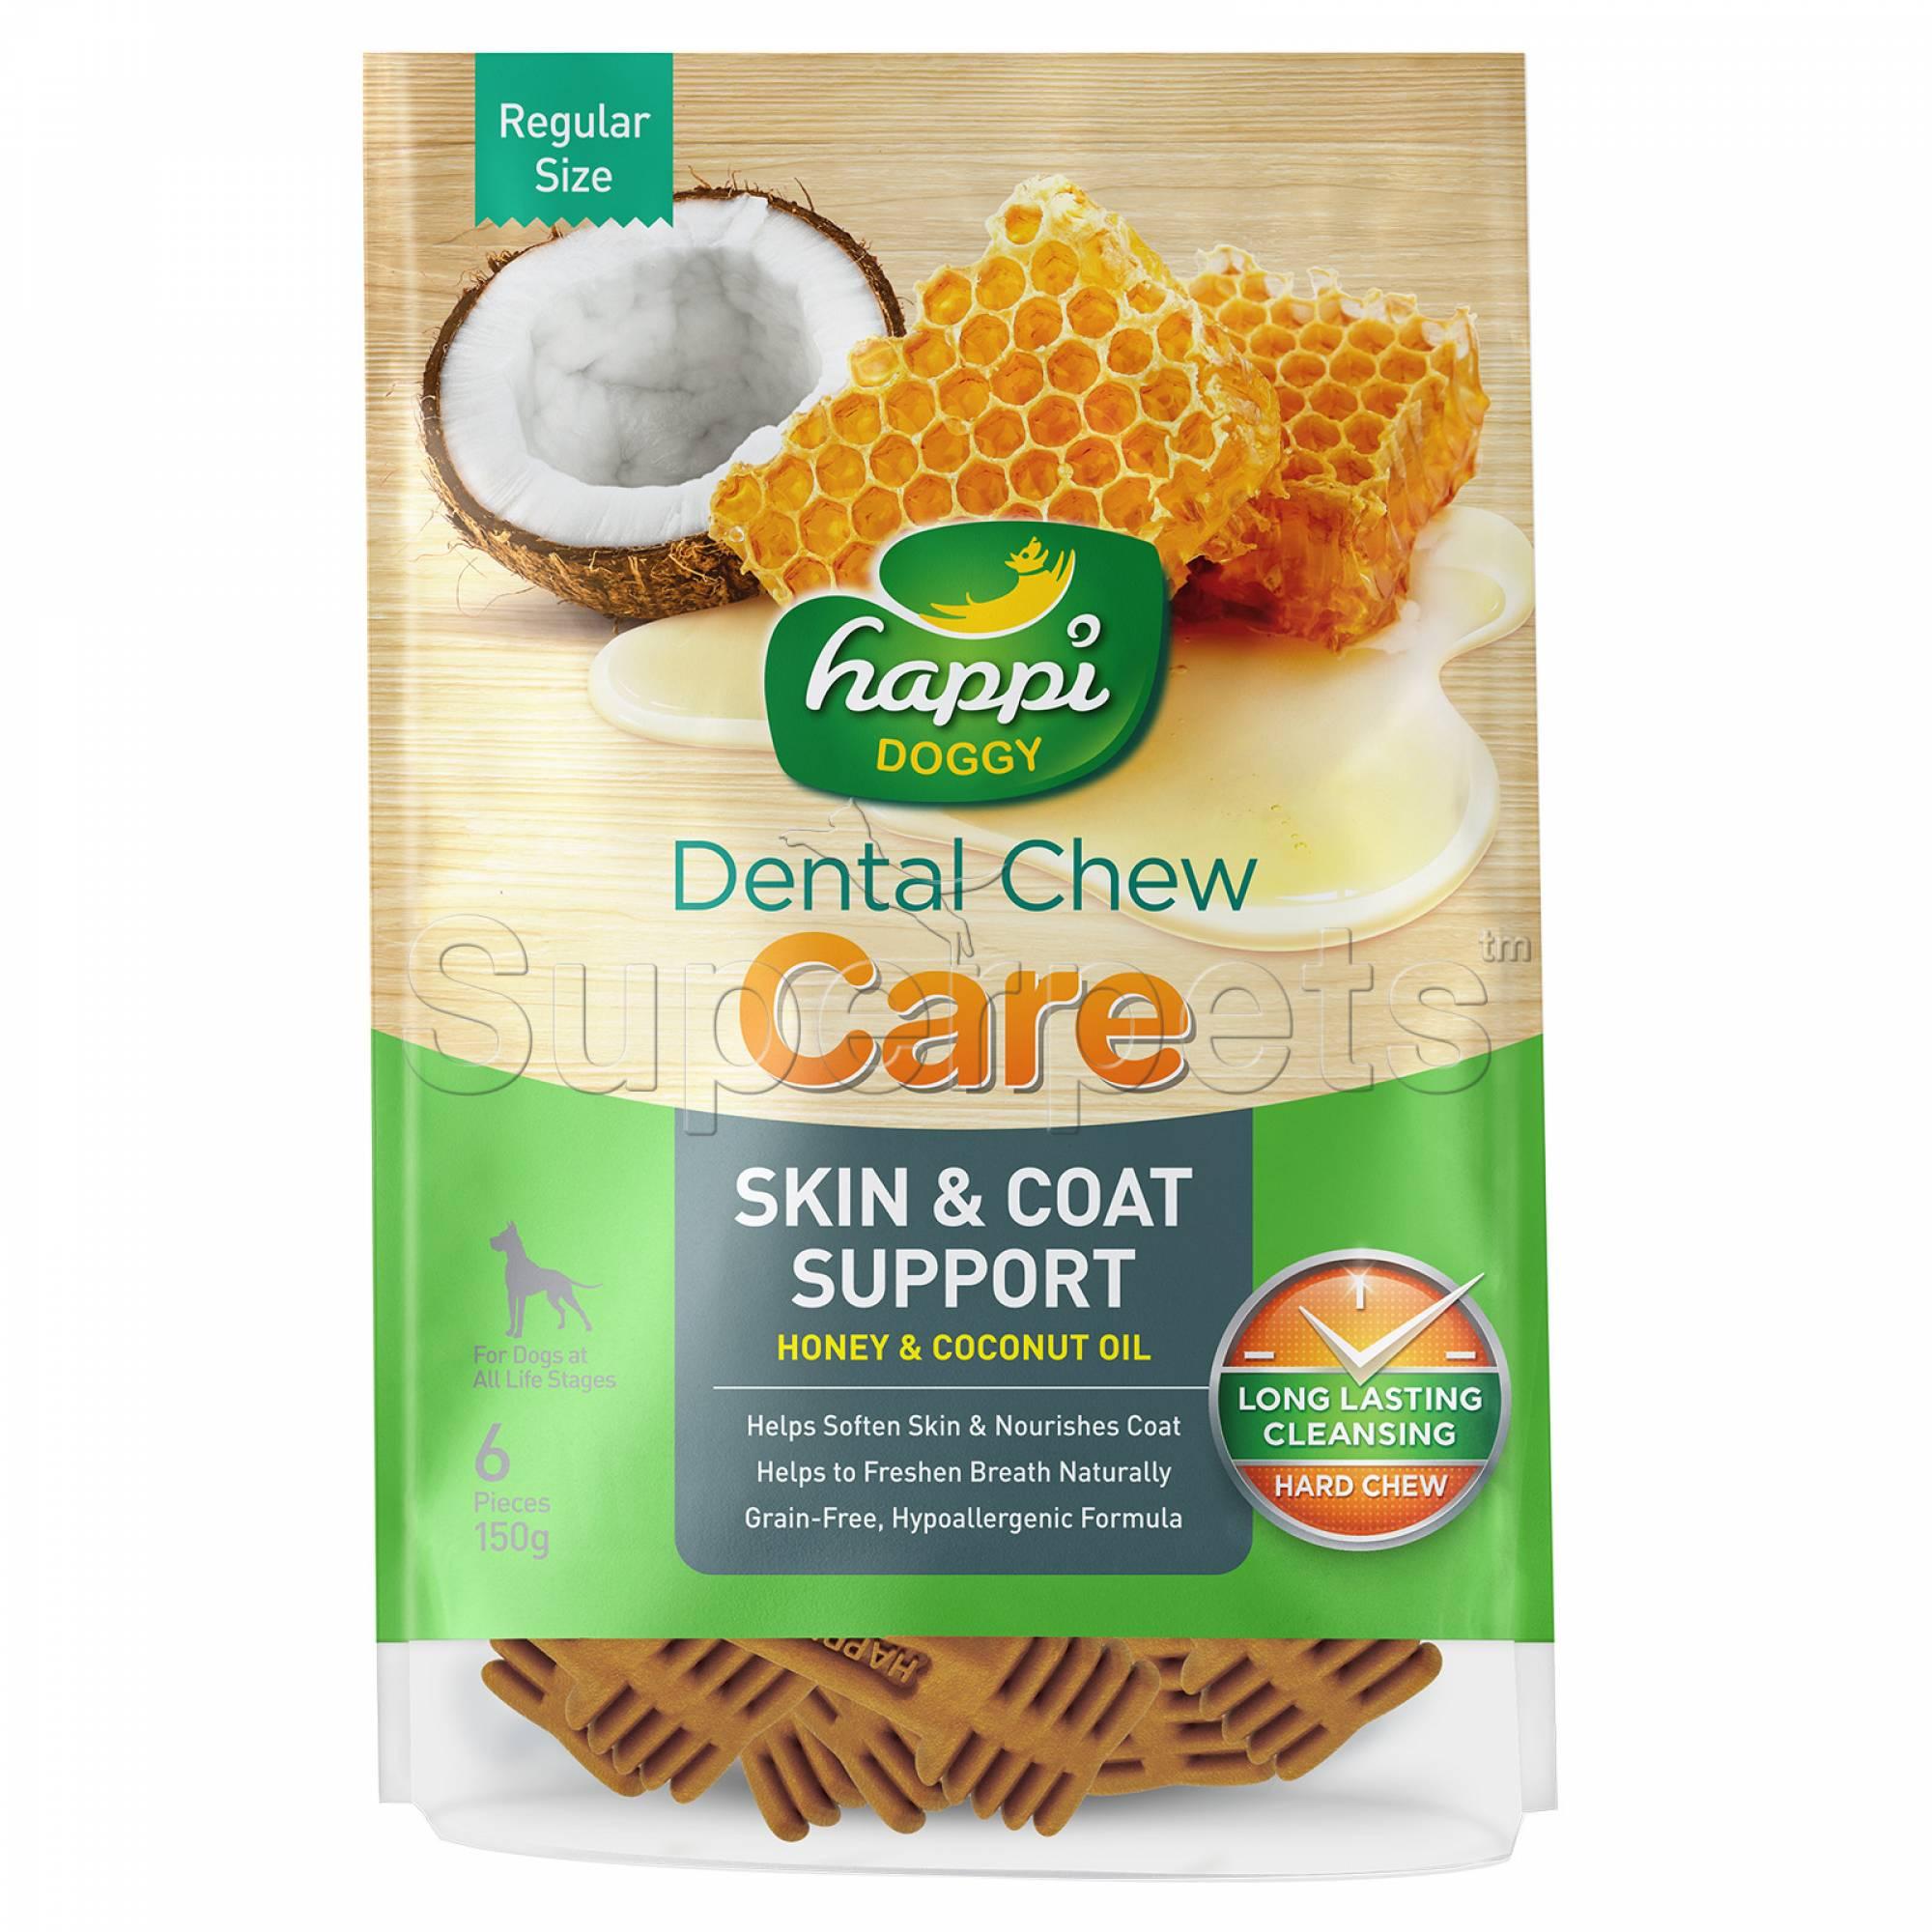 Happi Doggy H332 Dental Chew Care (Skin & Coat Support) Regular Size 6pcs 150g